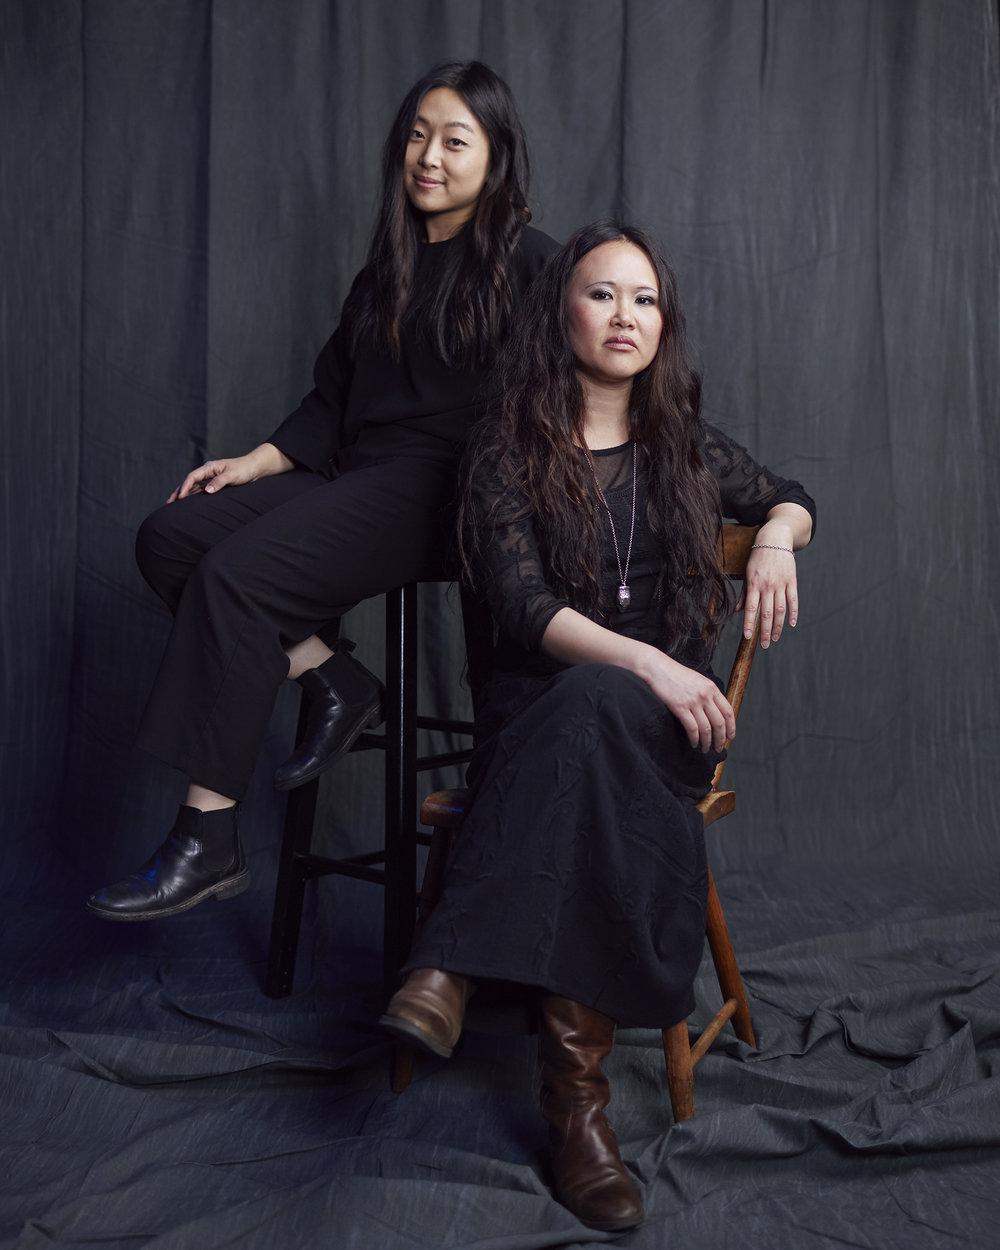 SF Film - 2017.04 - Helena Price Portrait Studio - 0028-sm.jpg